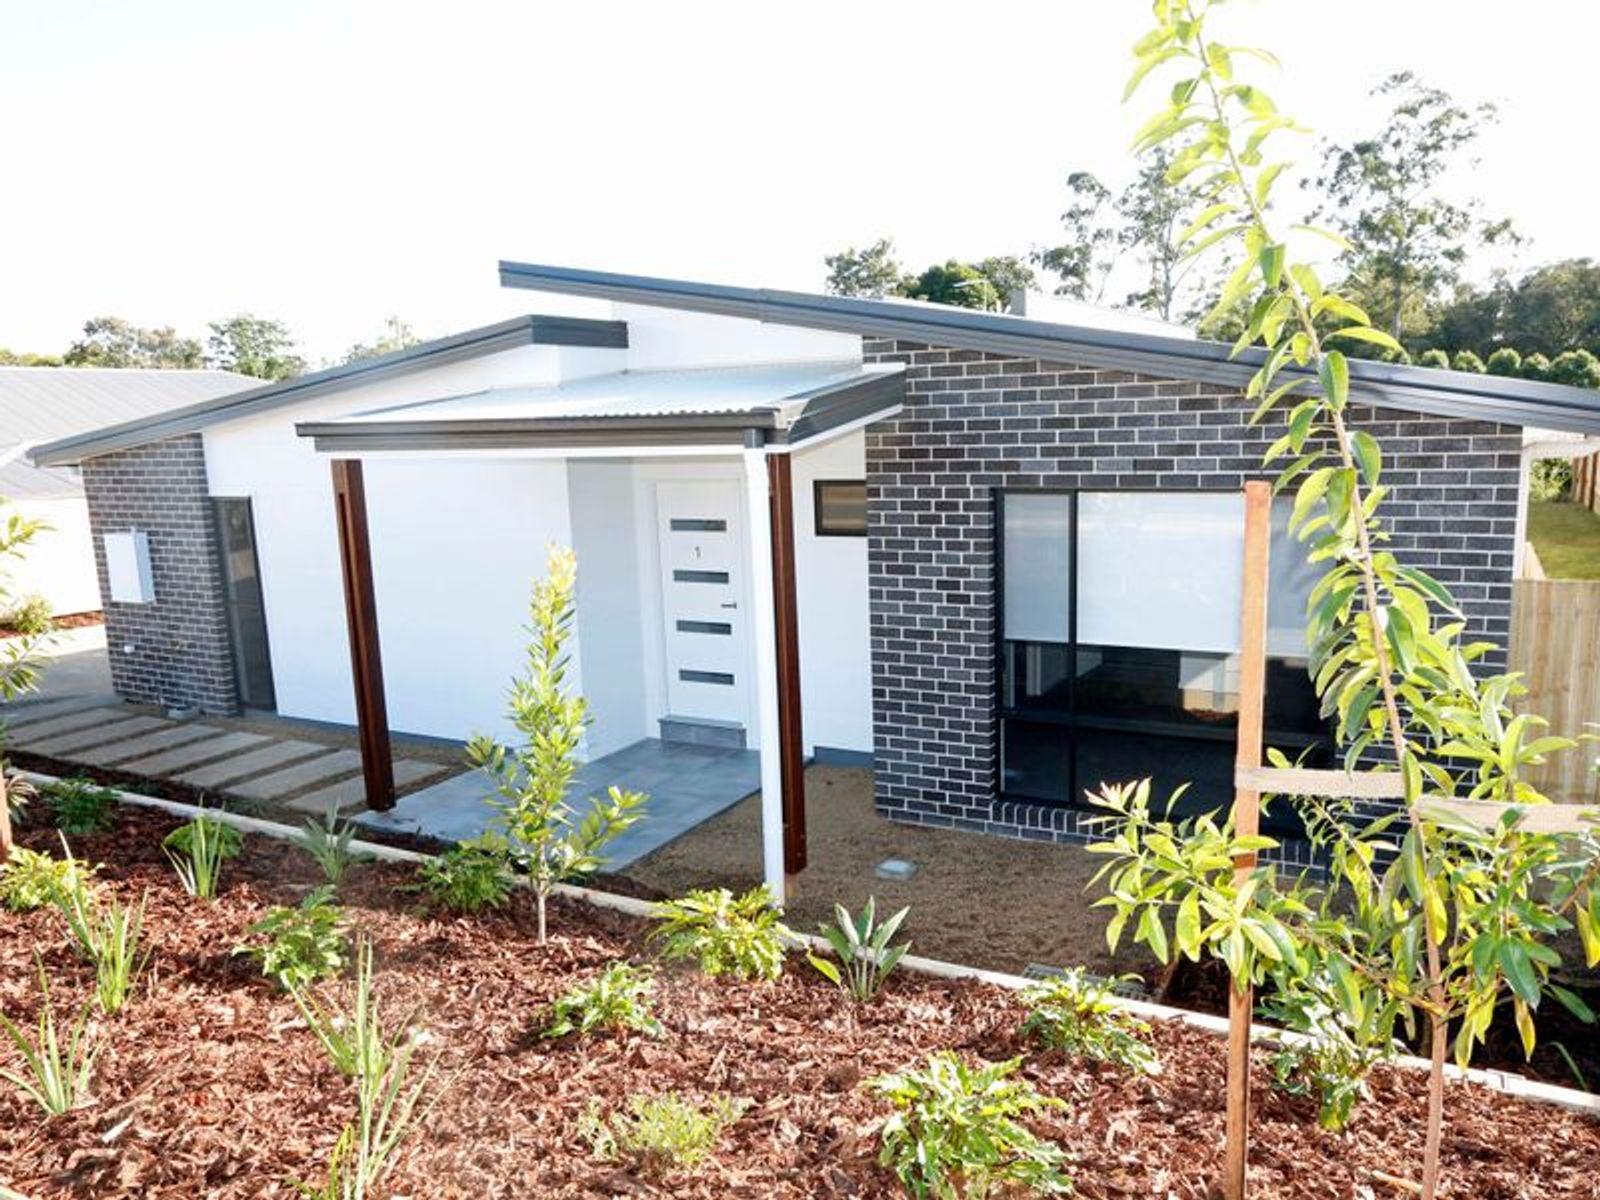 2/5 Tamarind Court, Woombye, QLD 4559